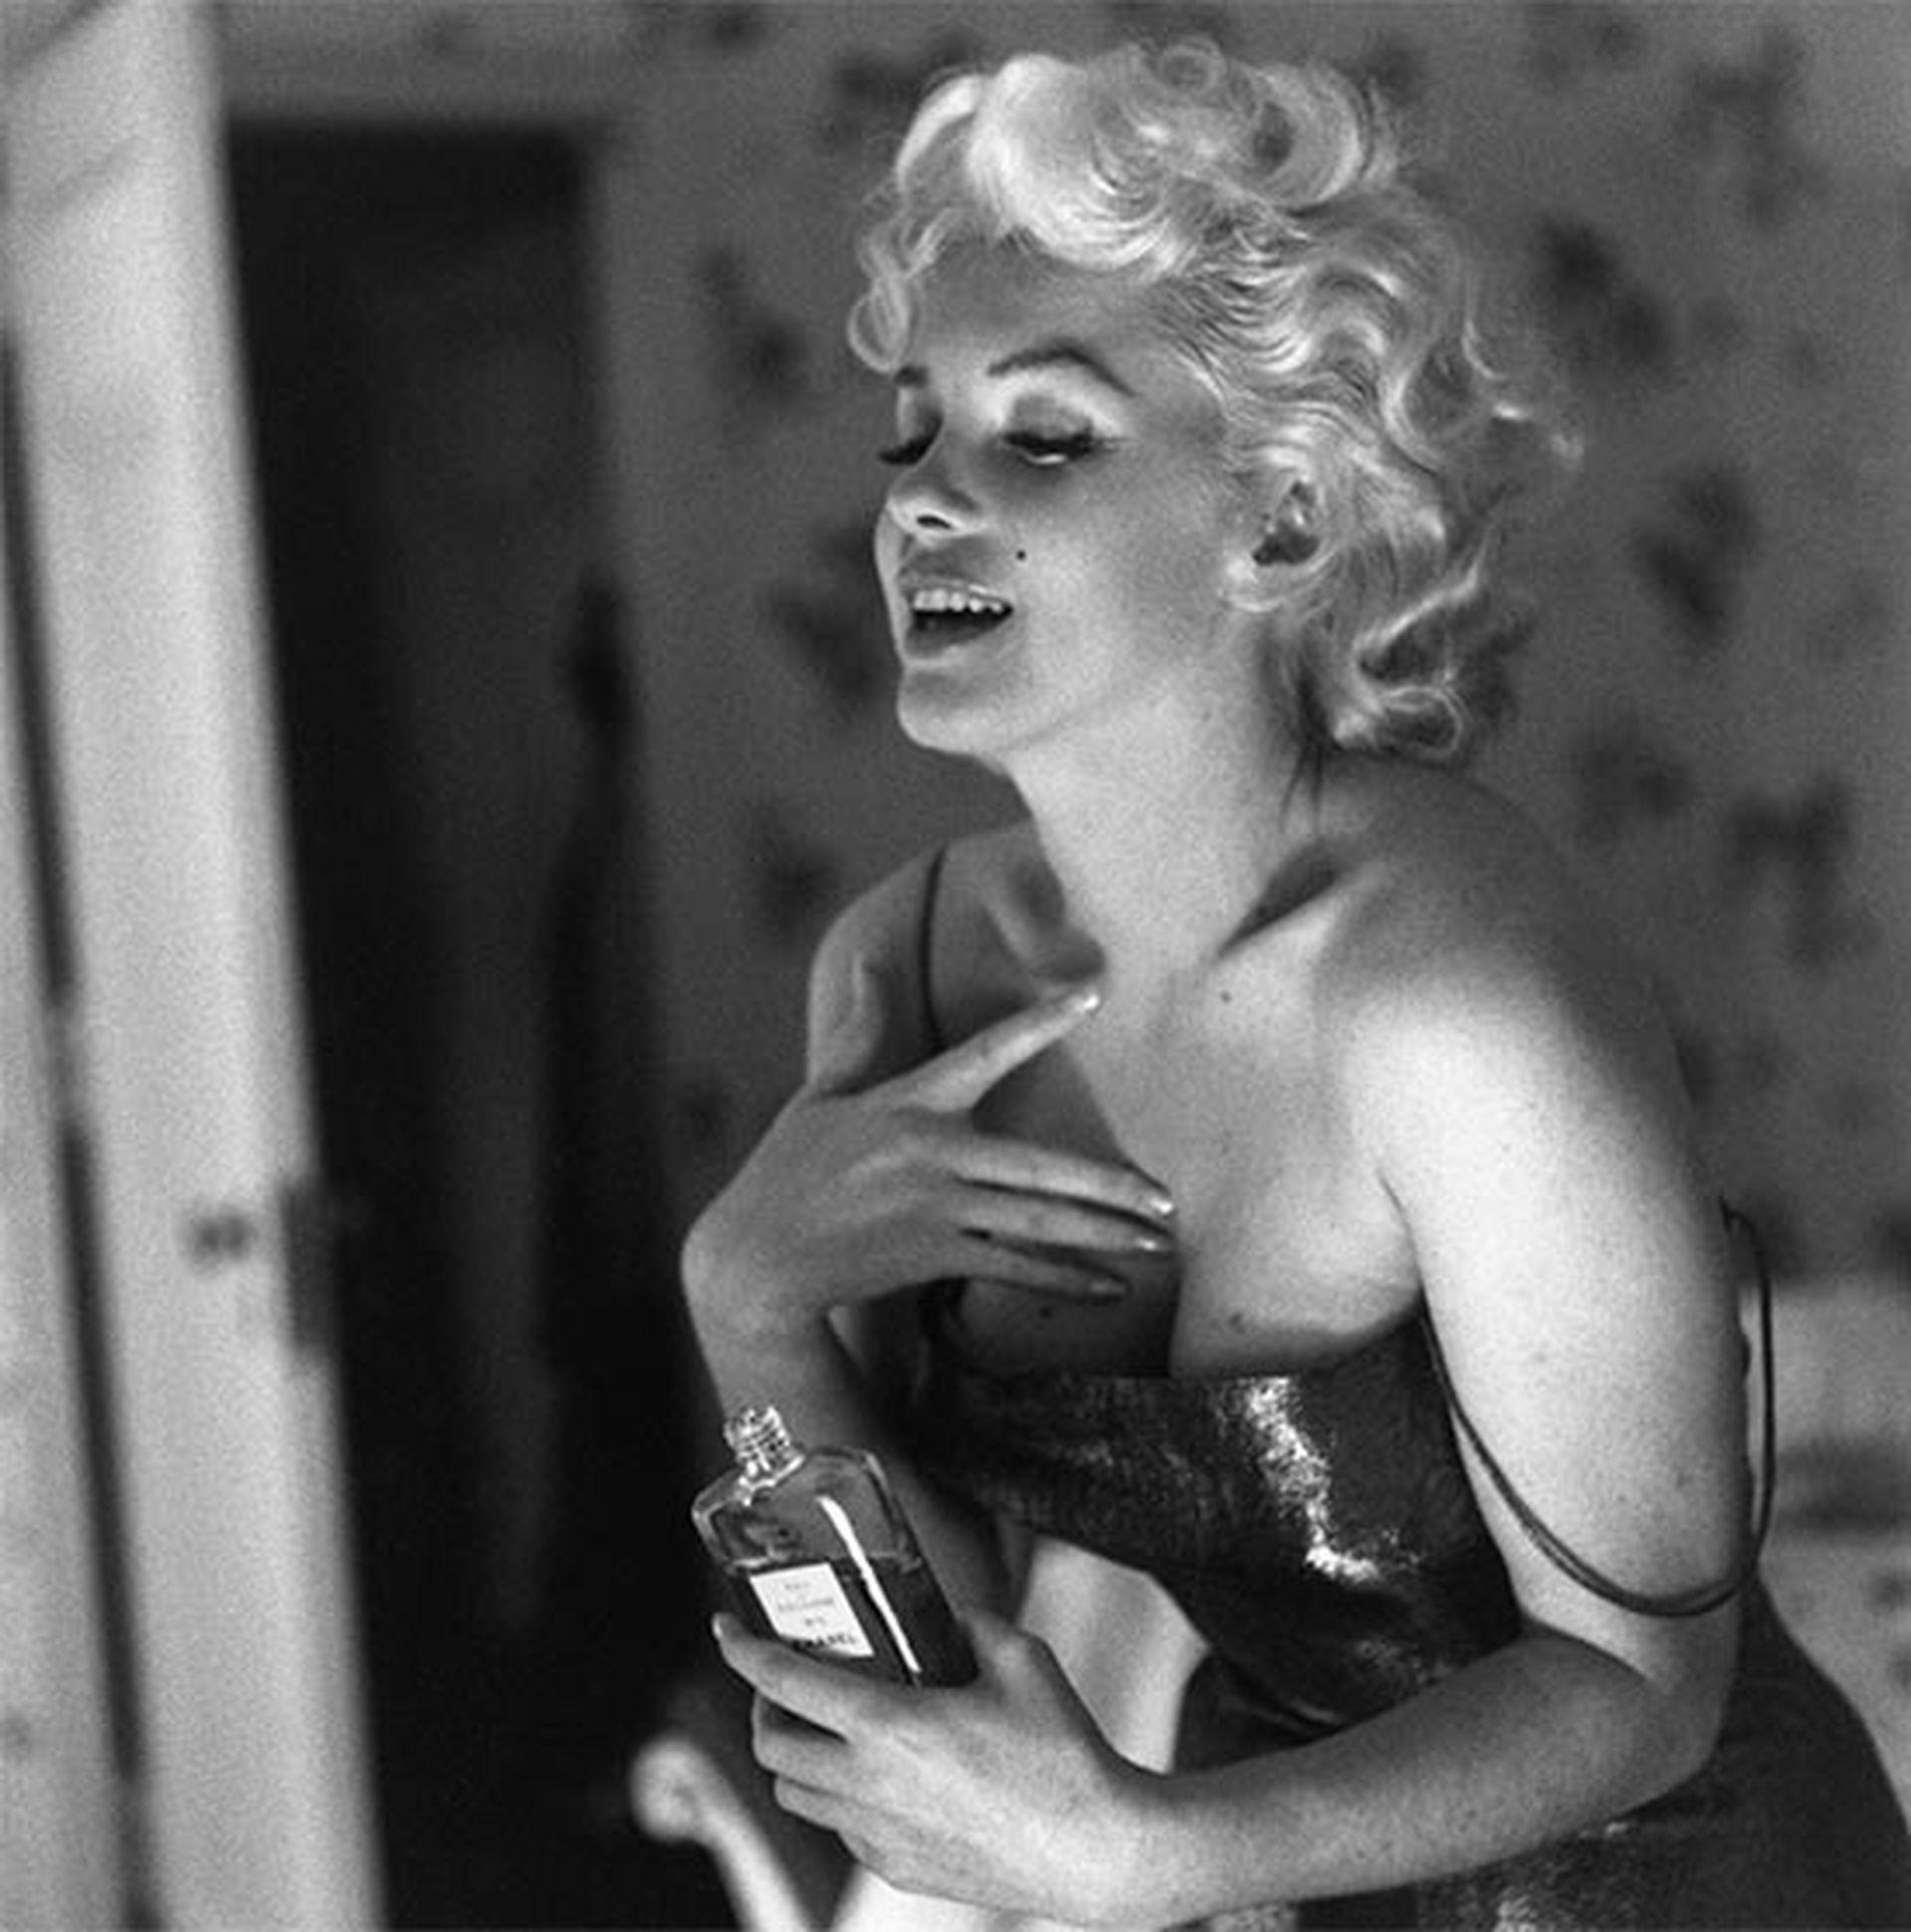 Monroe, la musa y su perfume pijama